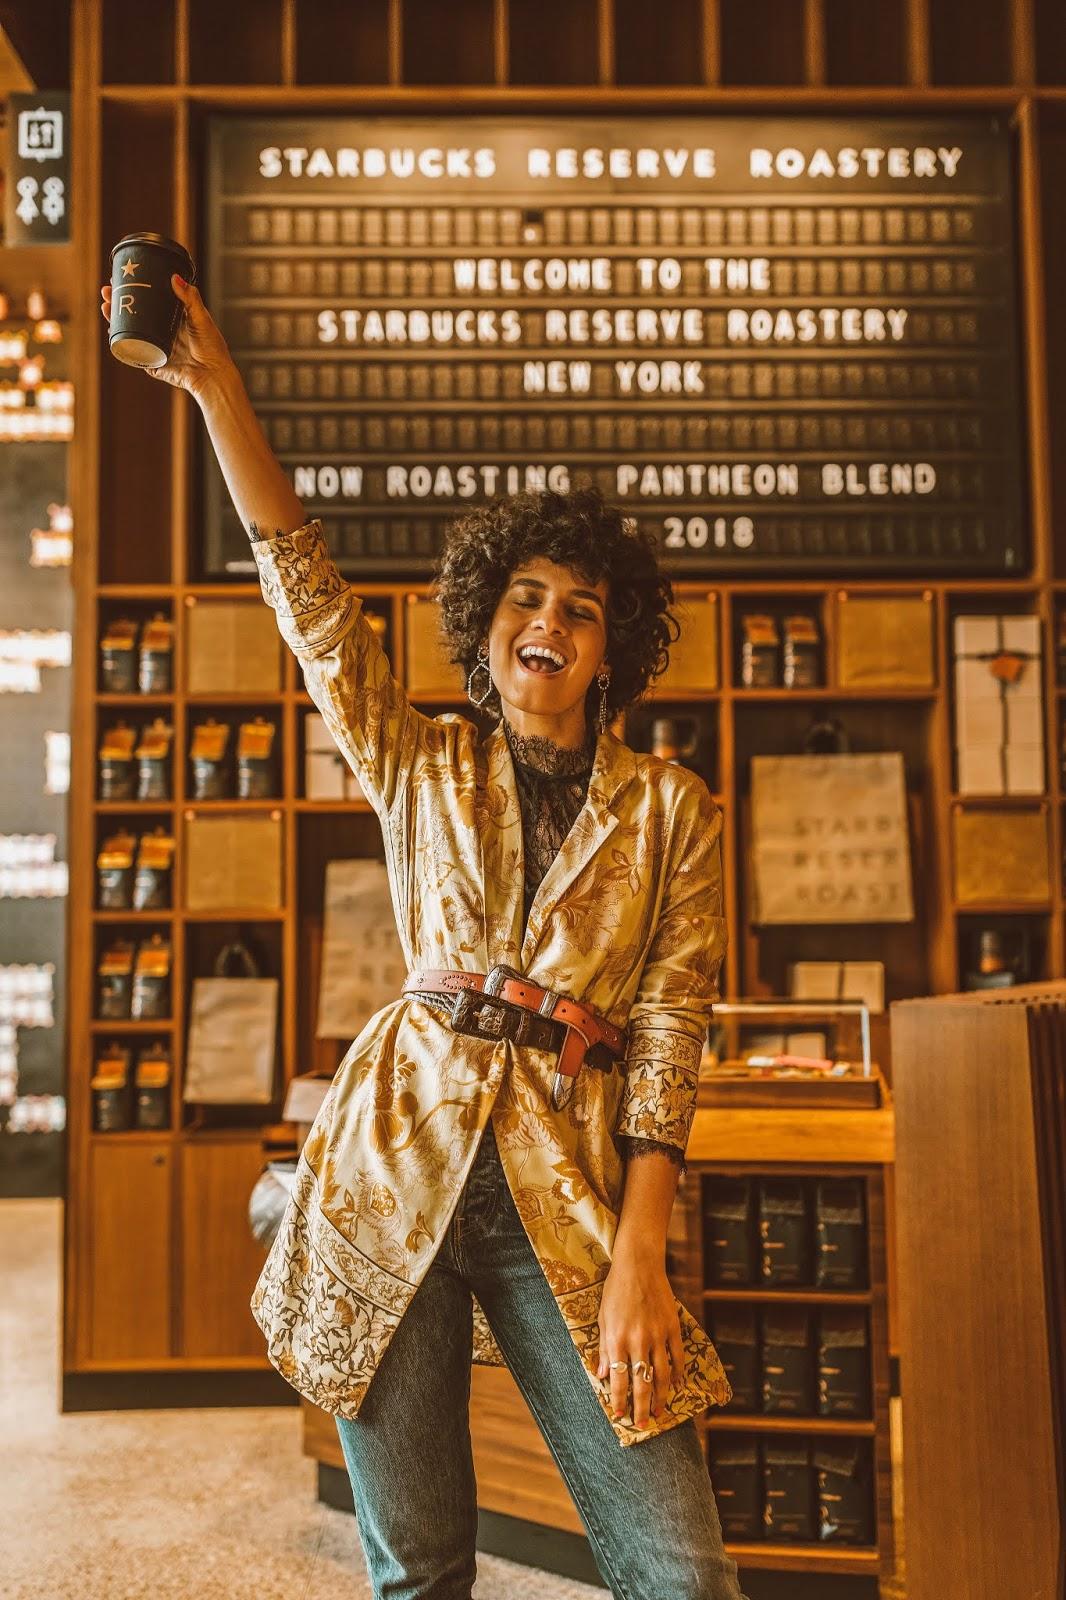 My New City Oasis Nyc Meet Starbucks Reserve Roastery